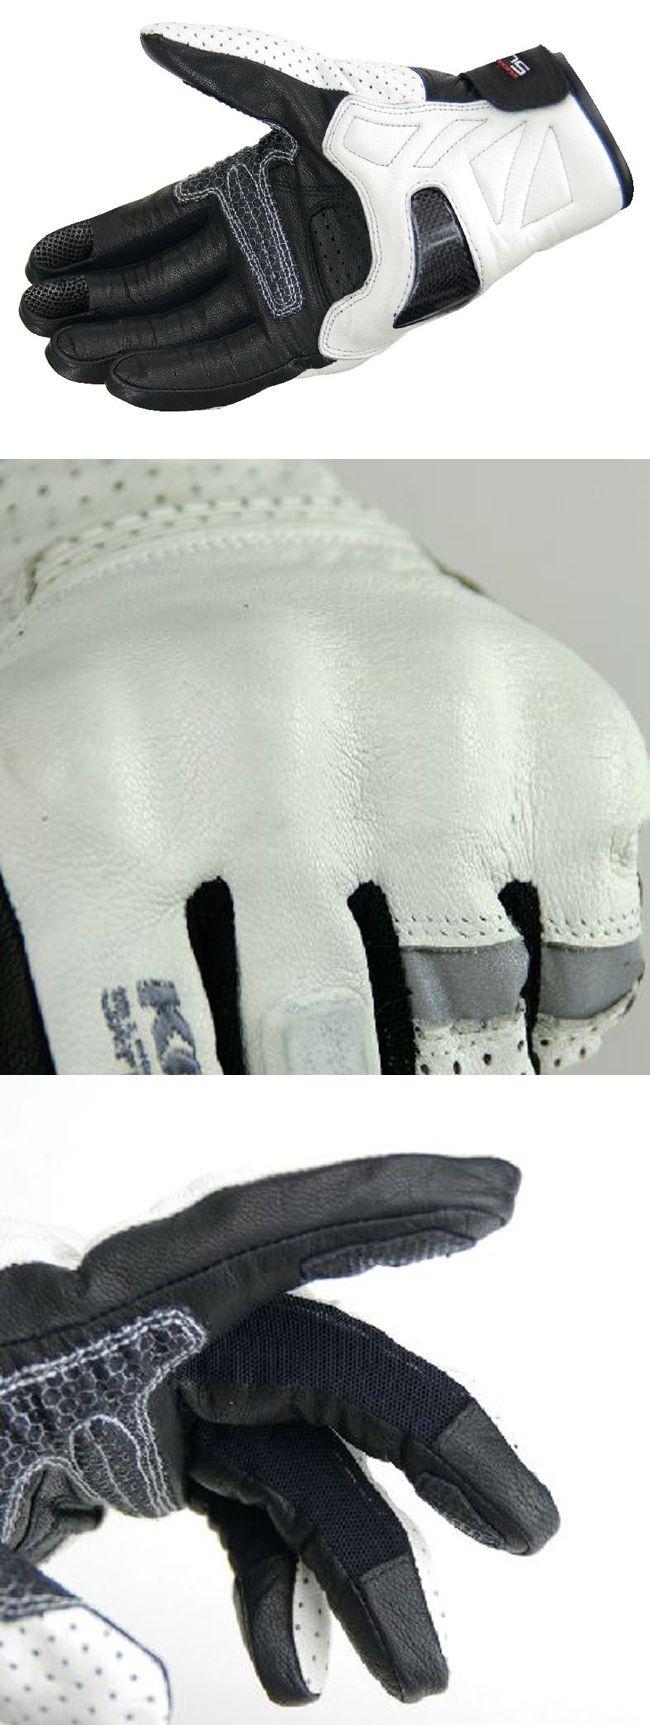 【KOMINE】GK-141 Super fit 防護皮革手套Appia - 「Webike-摩托百貨」